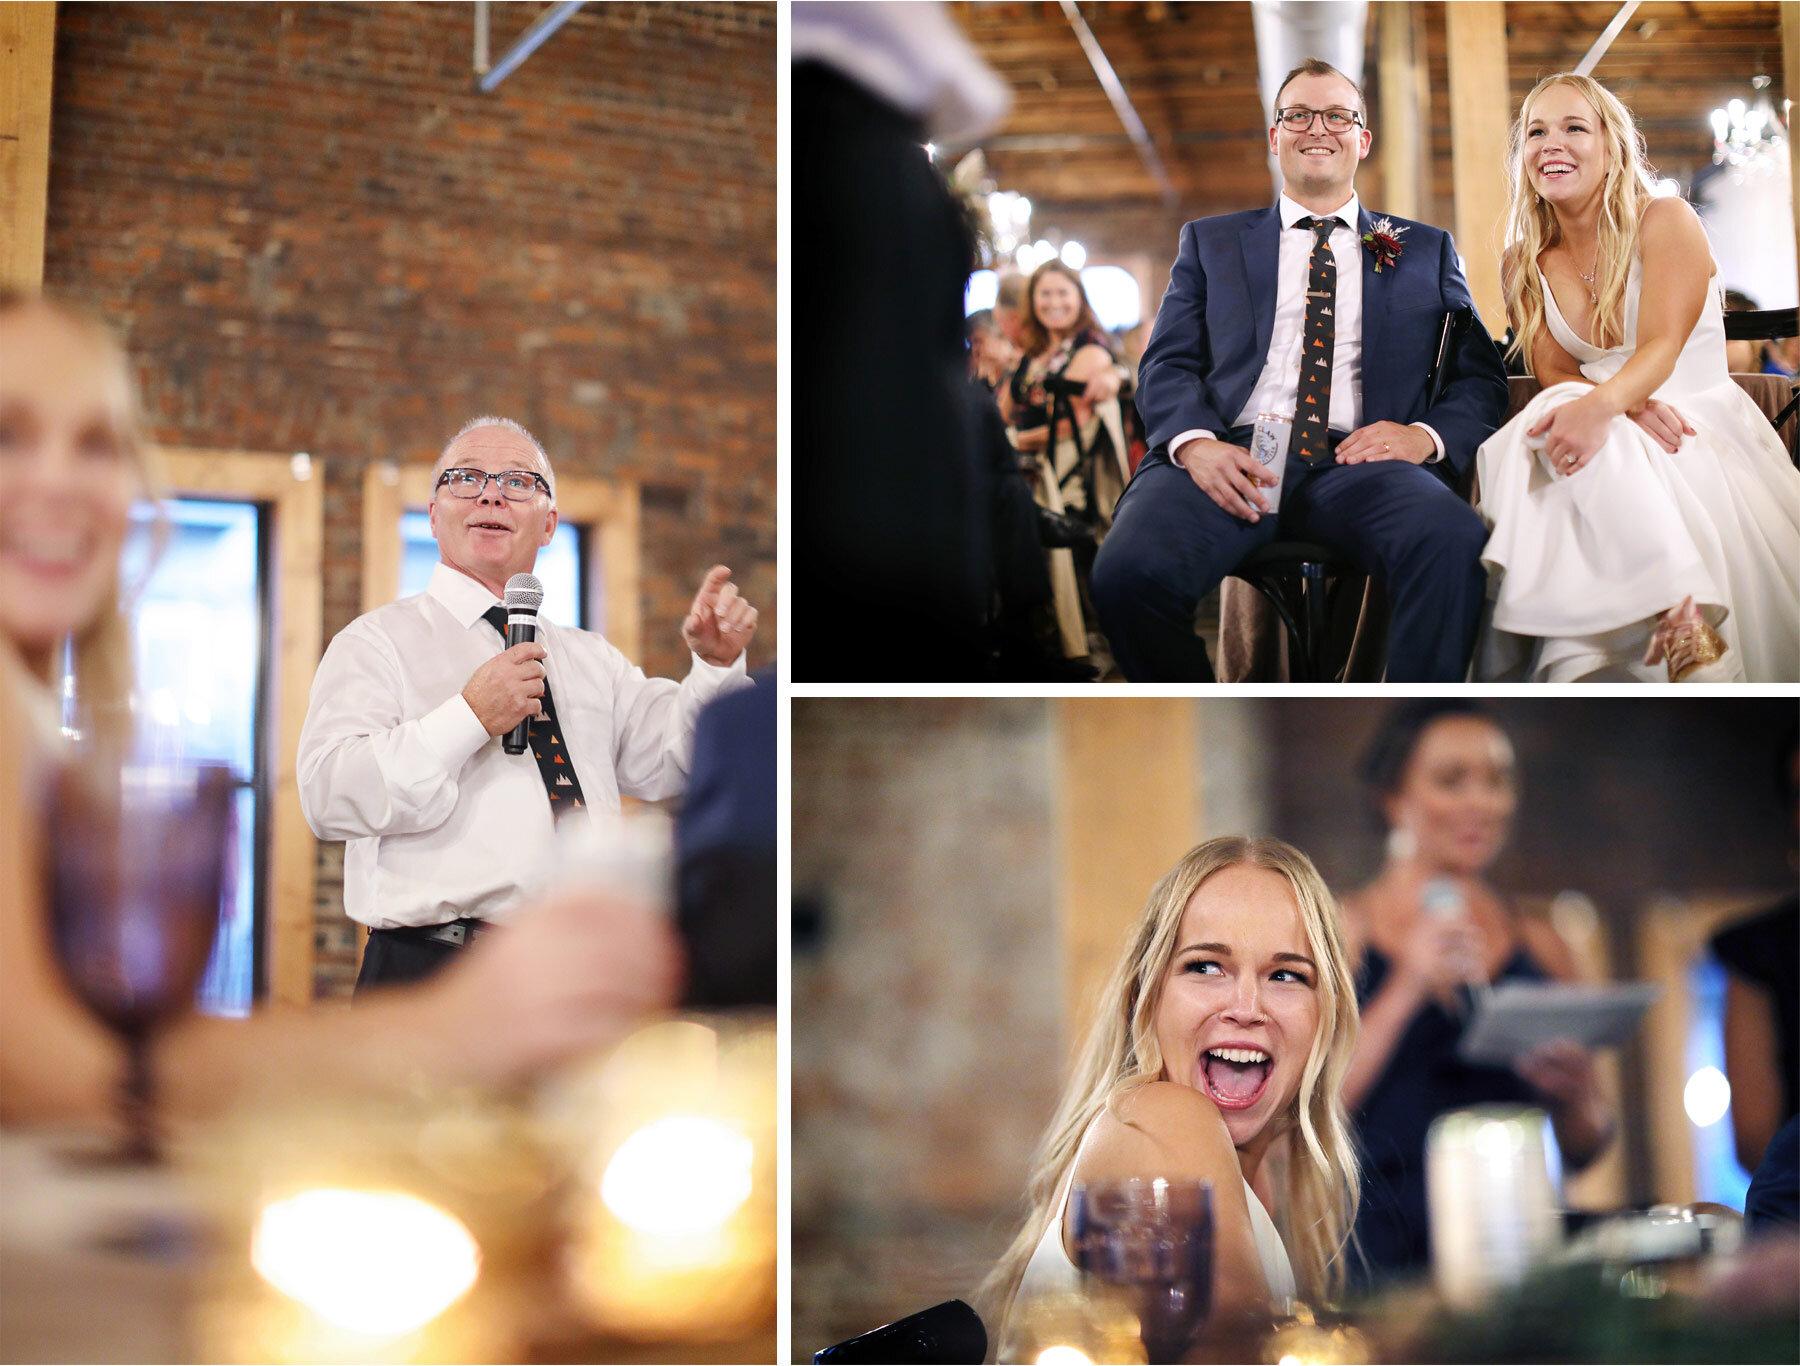 14-Vick-Photography-Wedding-Minneapolis-Minnesota-Earl-and-Wilson-Bride-Groom-Reception-Toast-Danielle-and-Tom.jpg